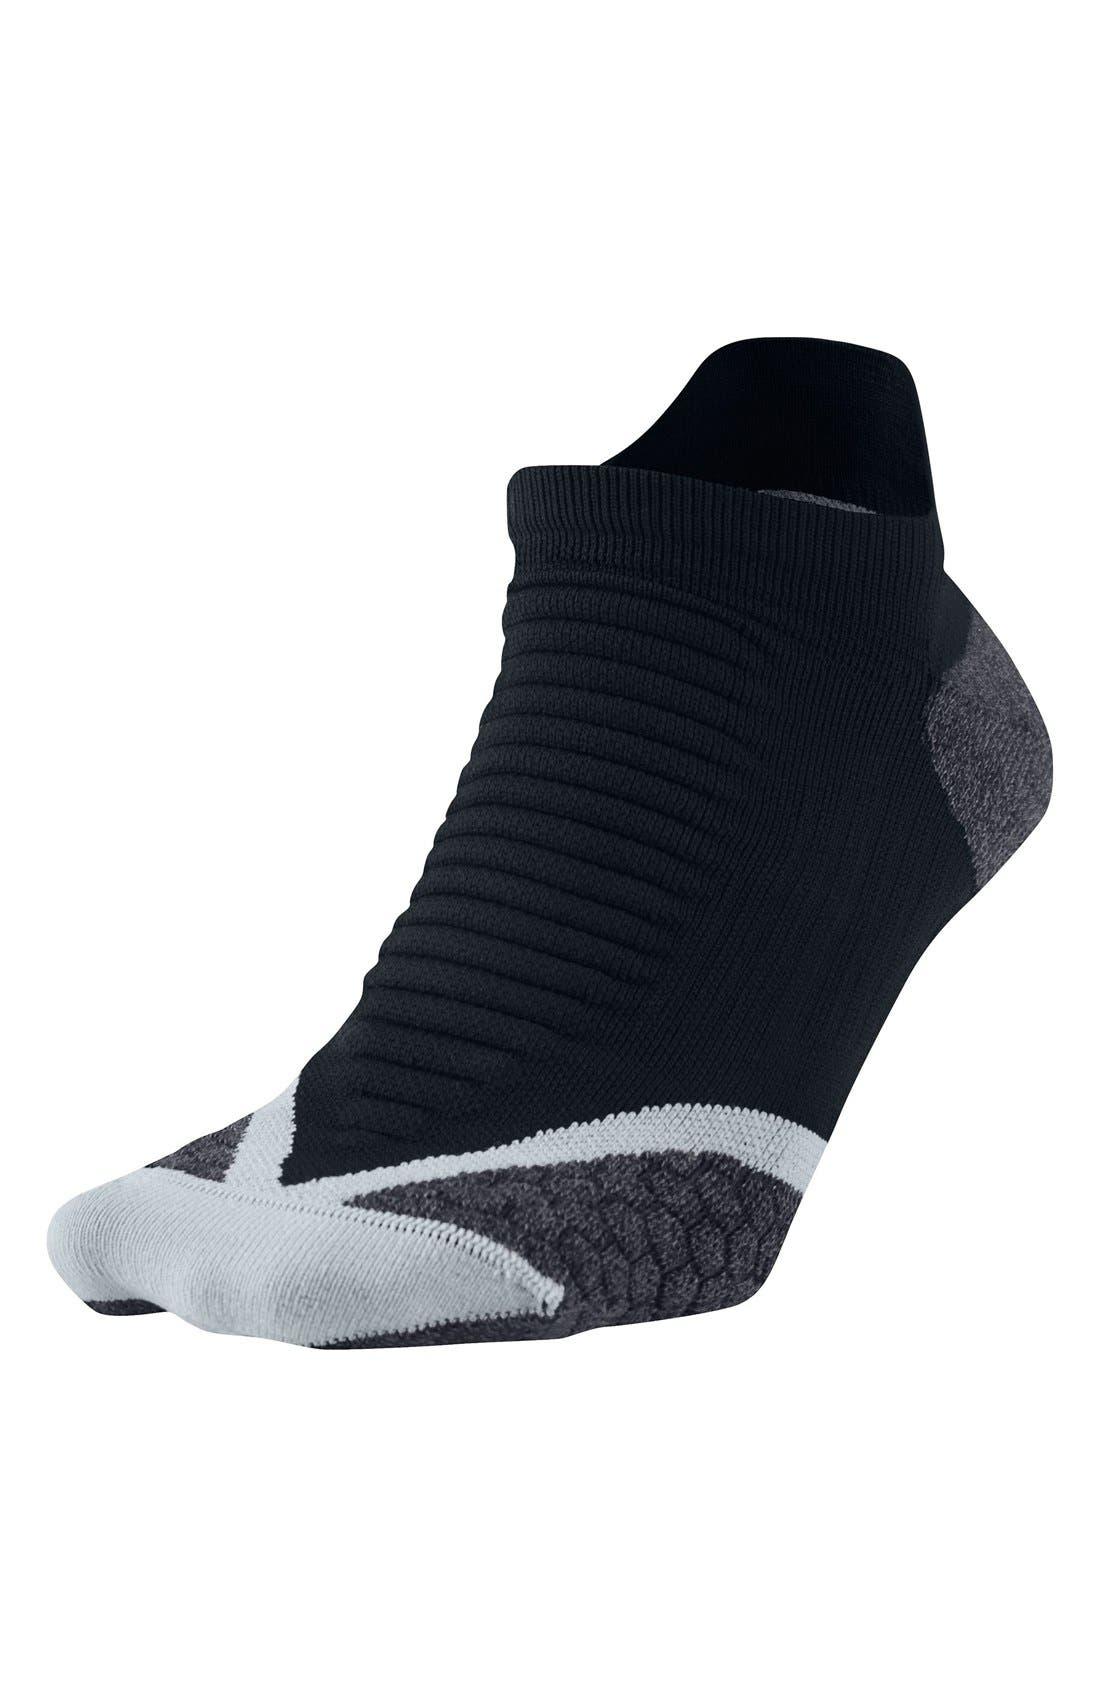 Elite Cushioned No-Show Tab Running Socks,                             Main thumbnail 1, color,                             010